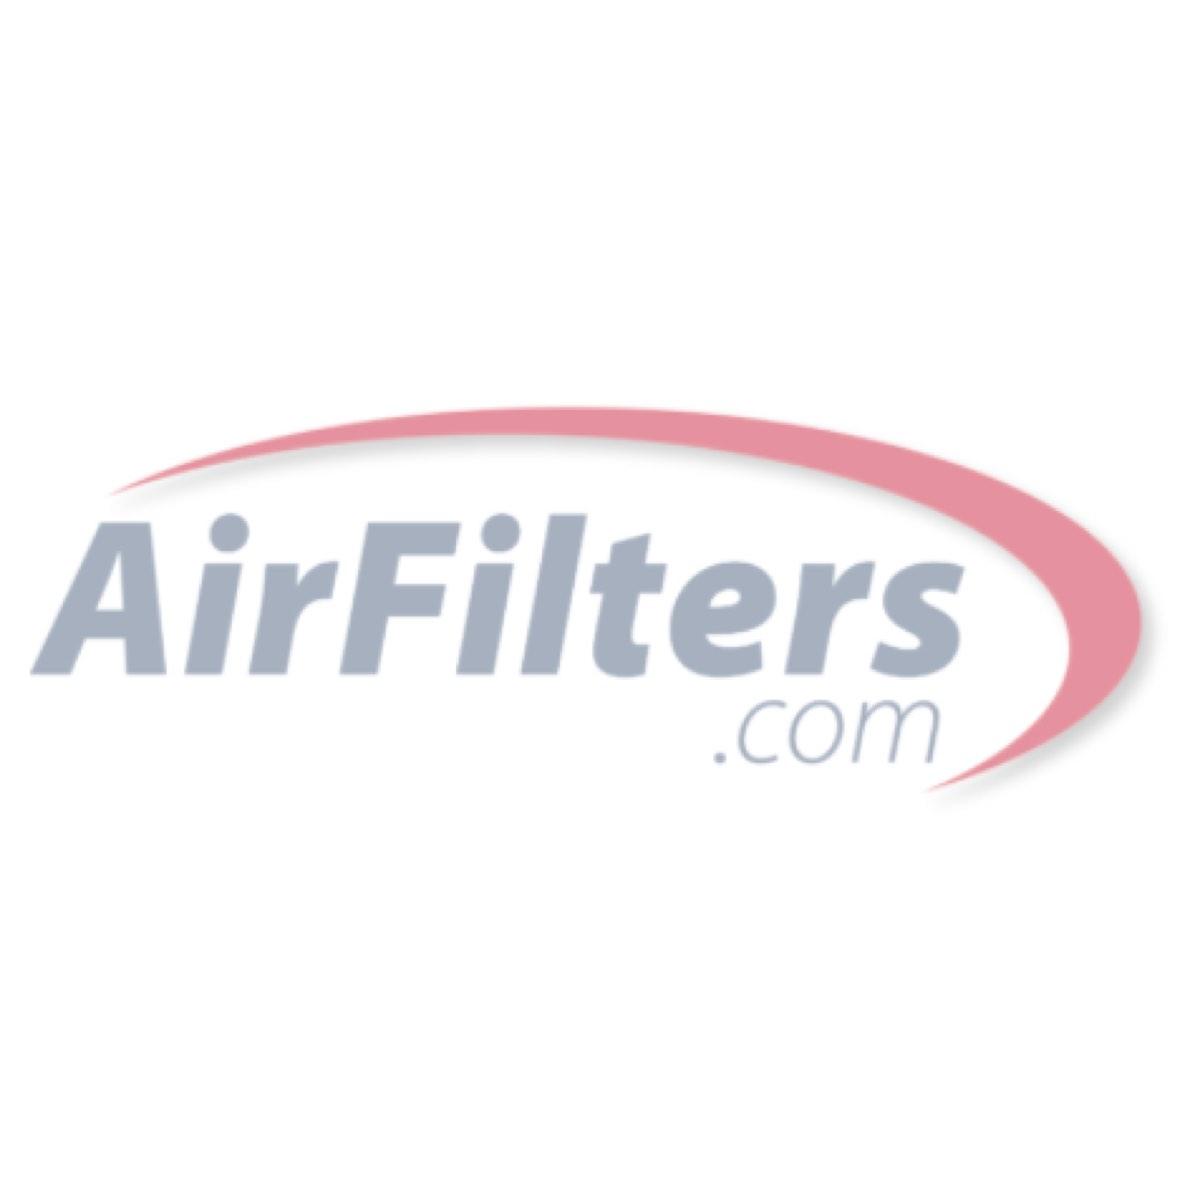 FILCCCAR0016 (15.88 x 24.88 x 4.38) Carrier® Filters (16x25x5) by Accumulair®